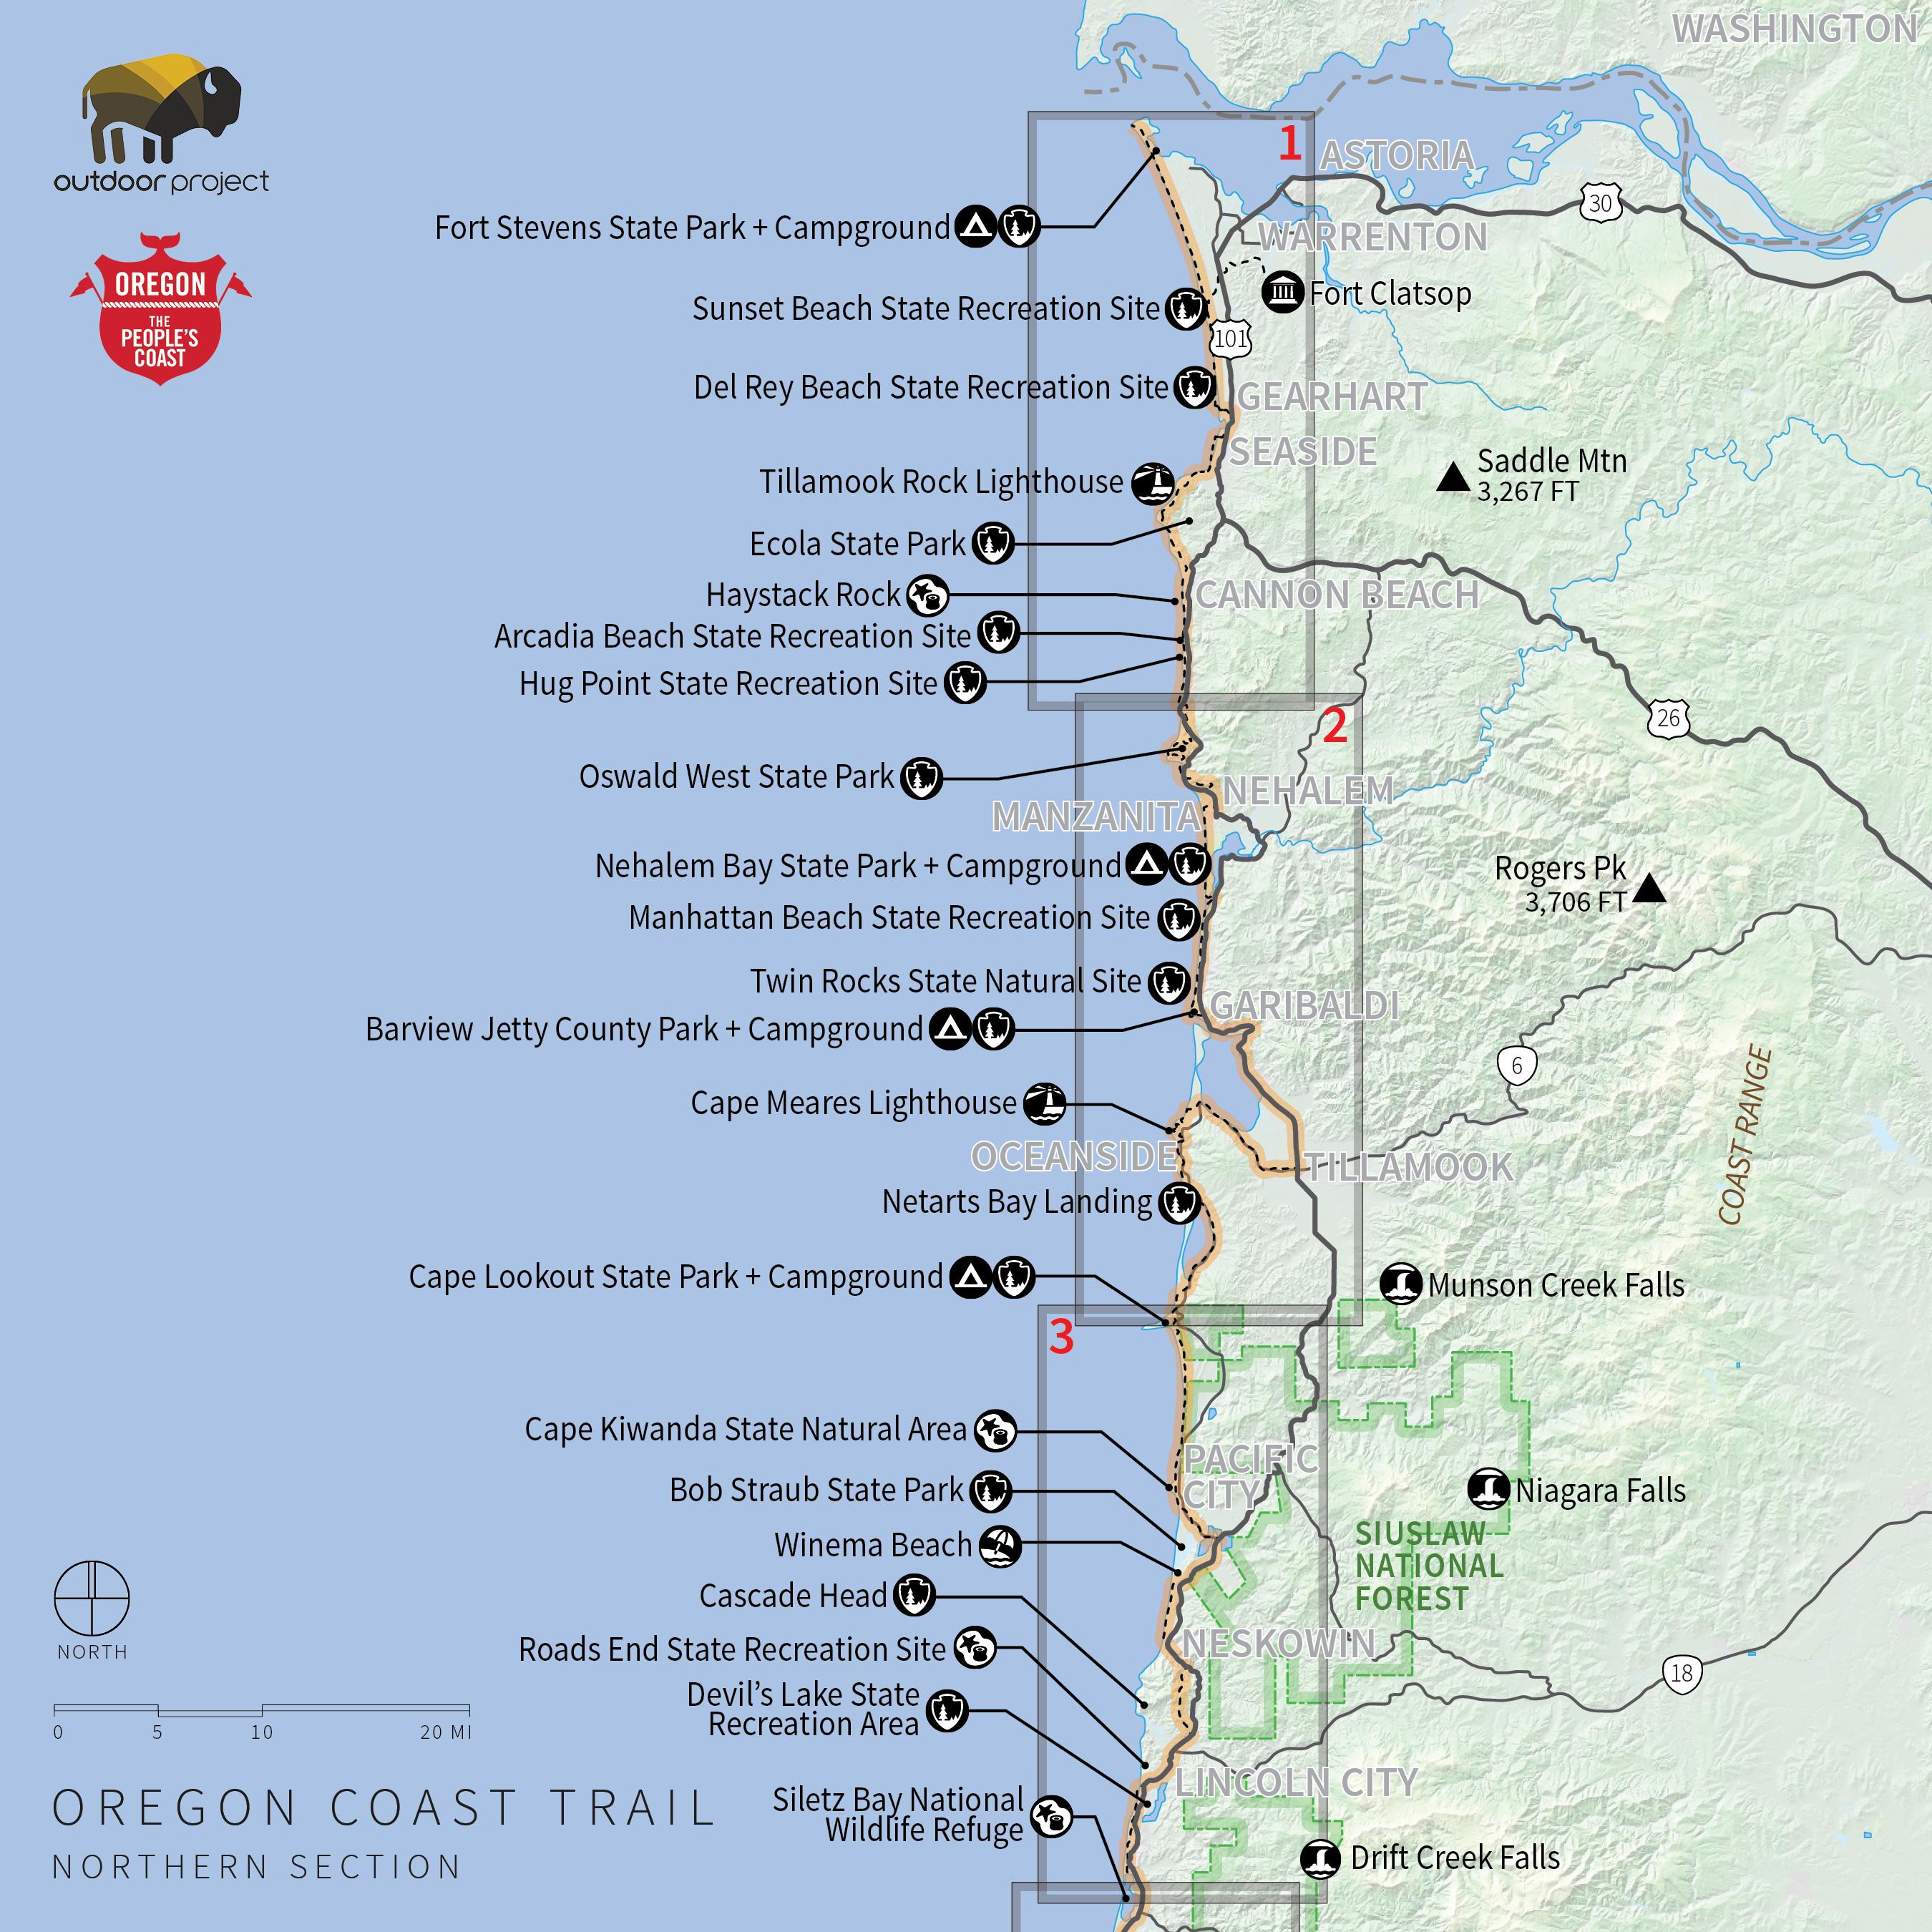 Oregon Coast Trail Northern Map Reference Camping California Coast - Map Of Oregon And California Coastline